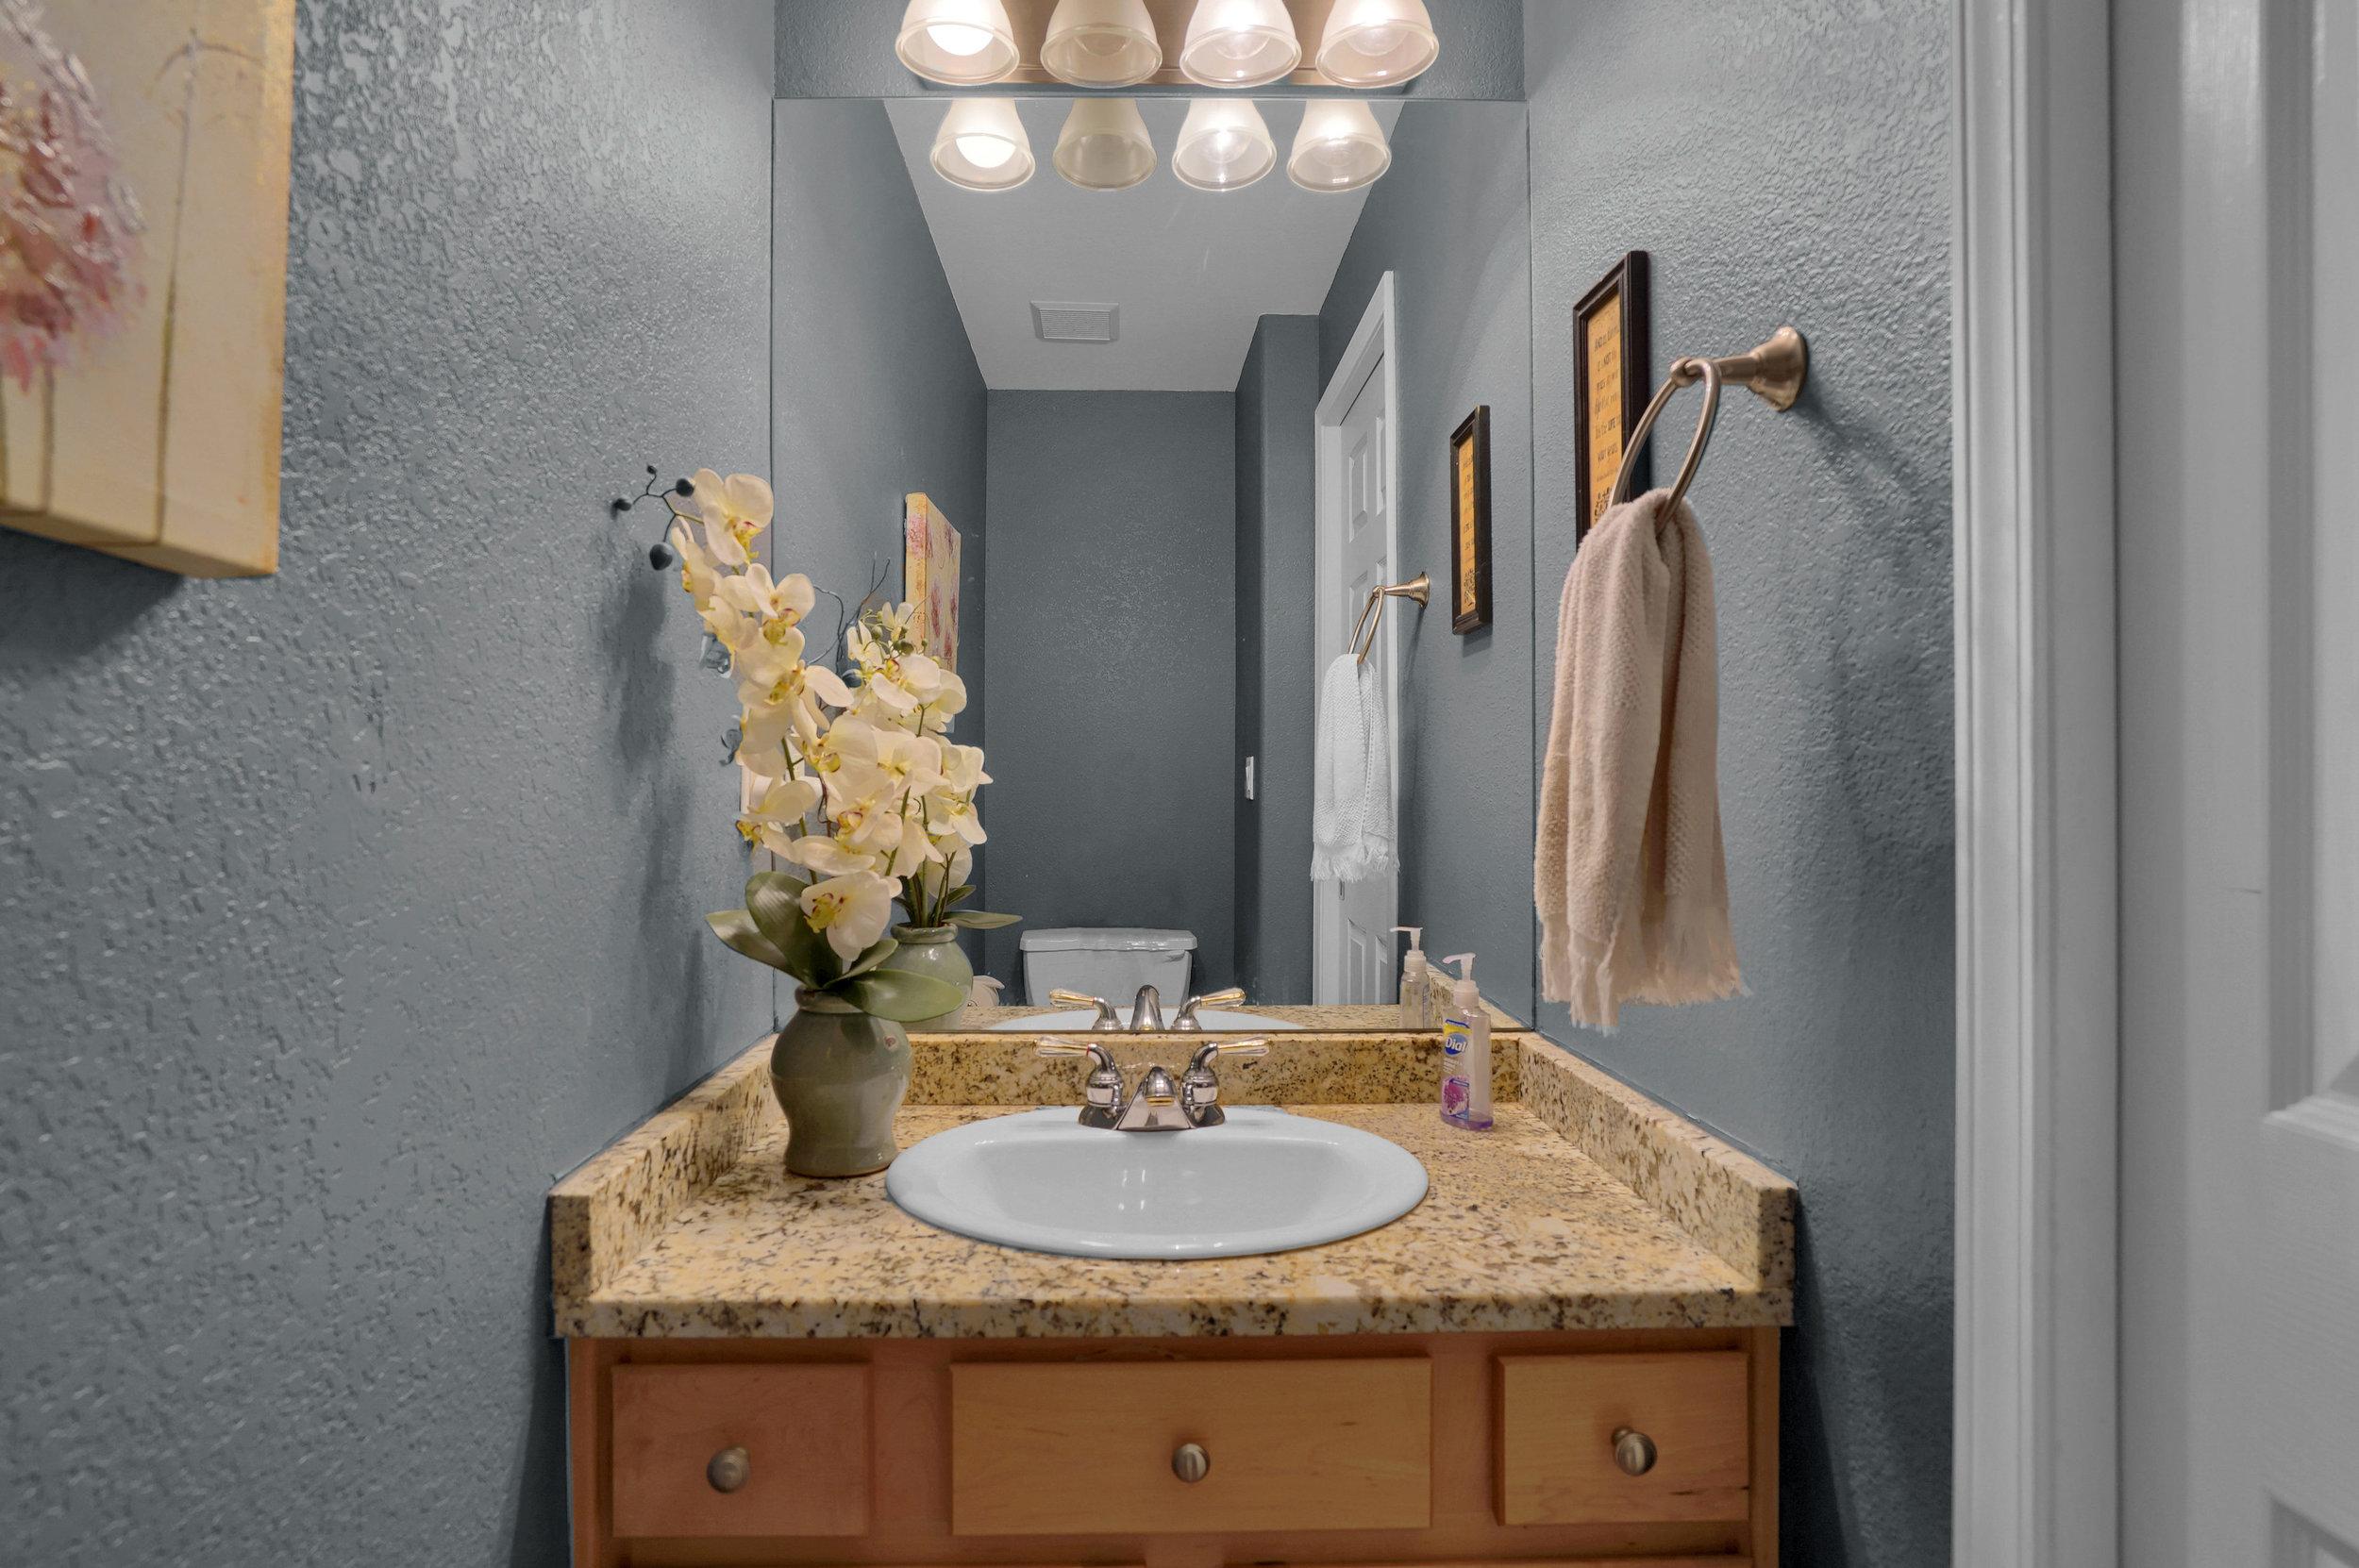 2756 Kittyhawk Road Colorado-print-033-021-Bathroom-3935x2616-300dpi.jpg